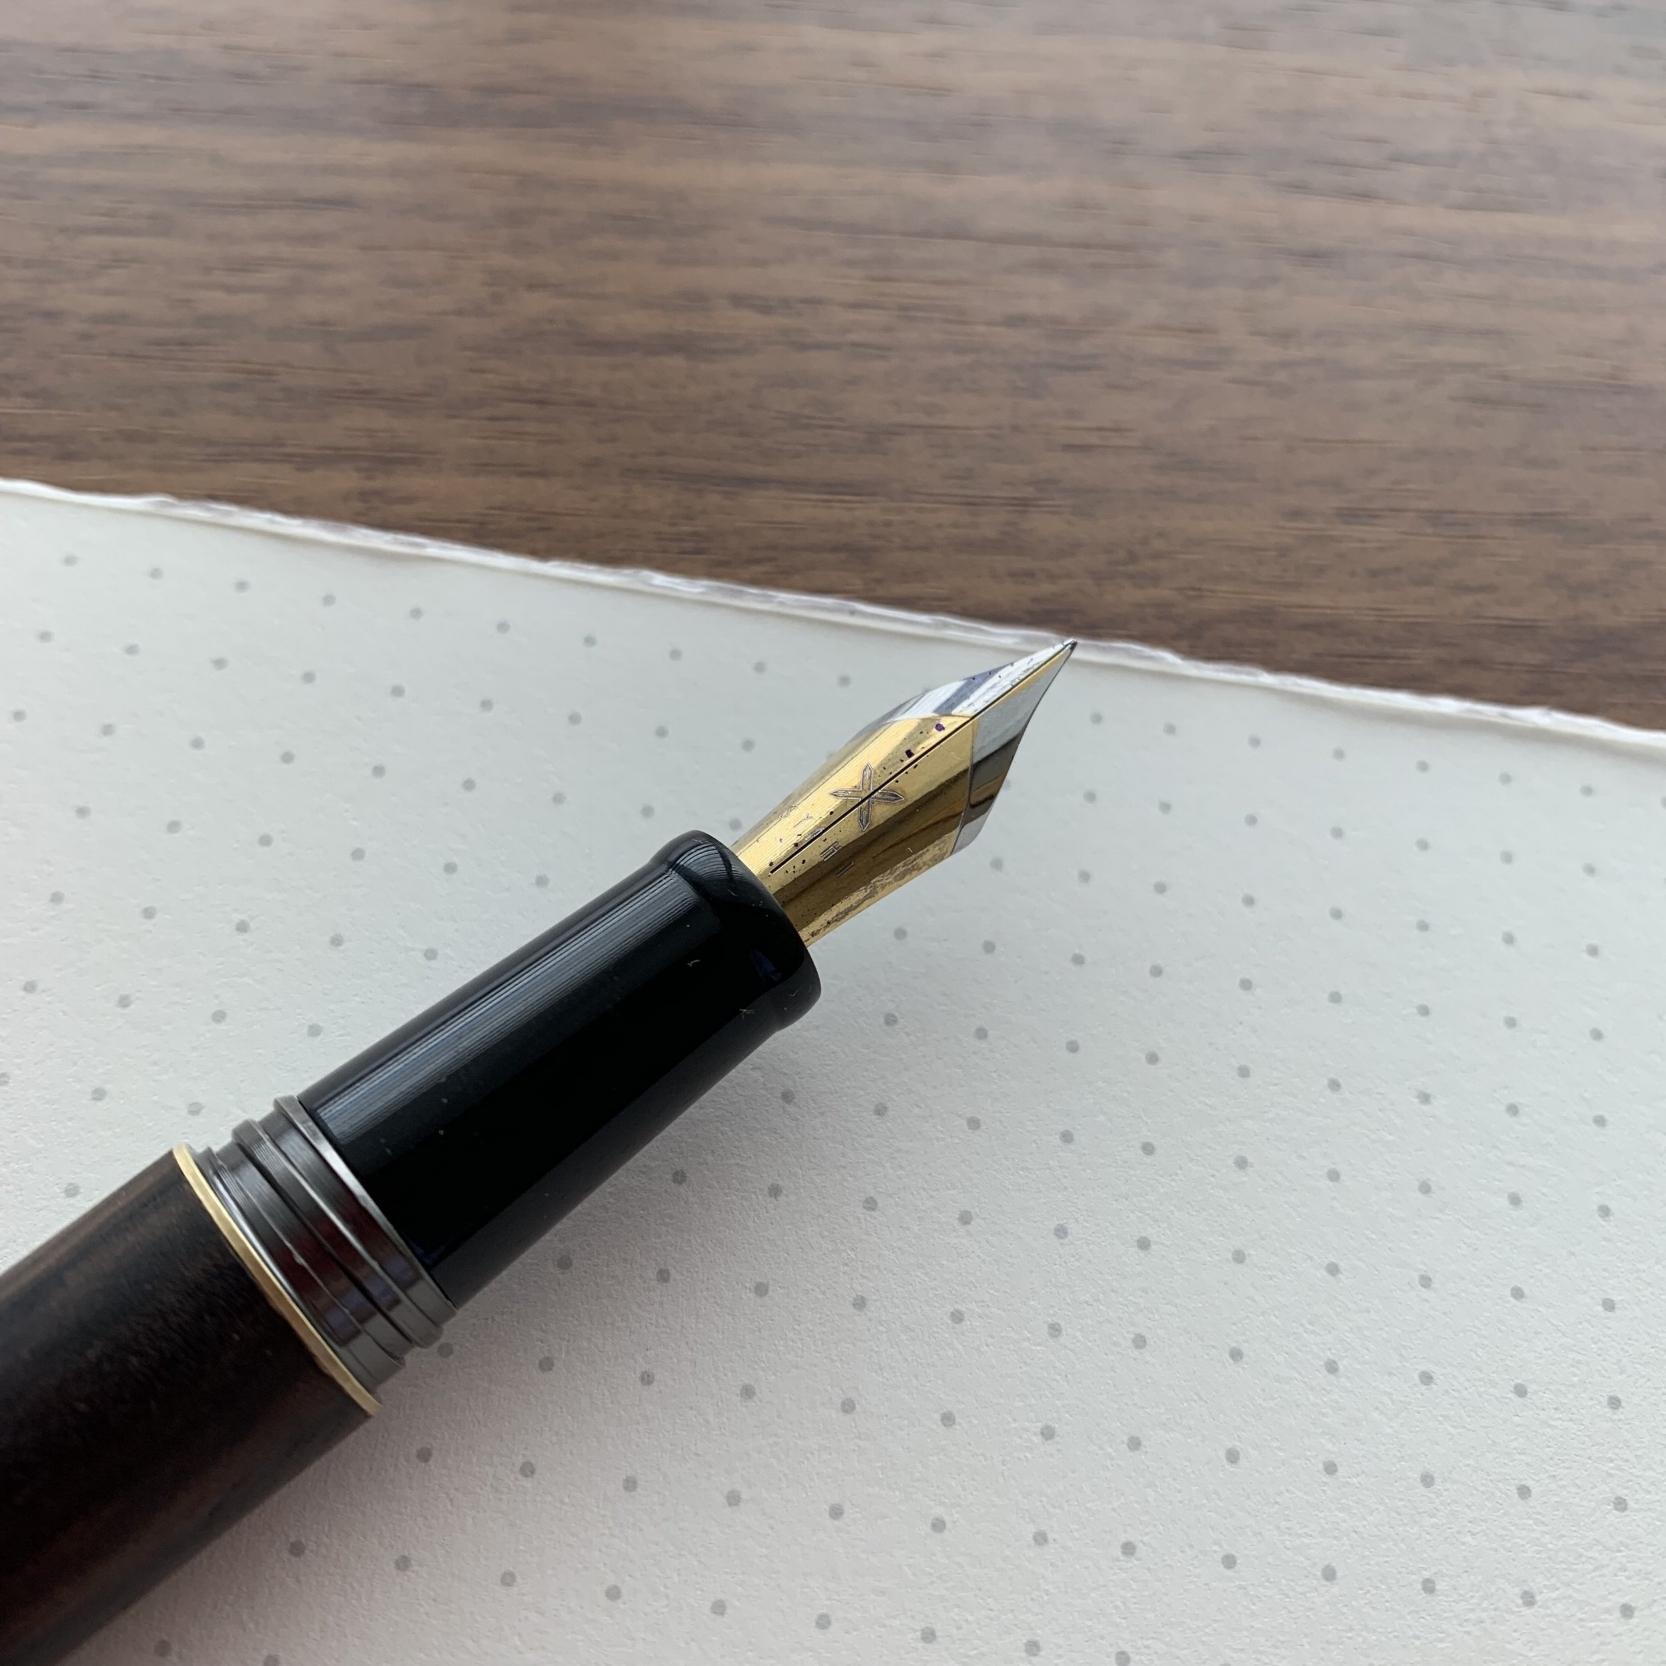 Syahi-Monarch-writing-sample